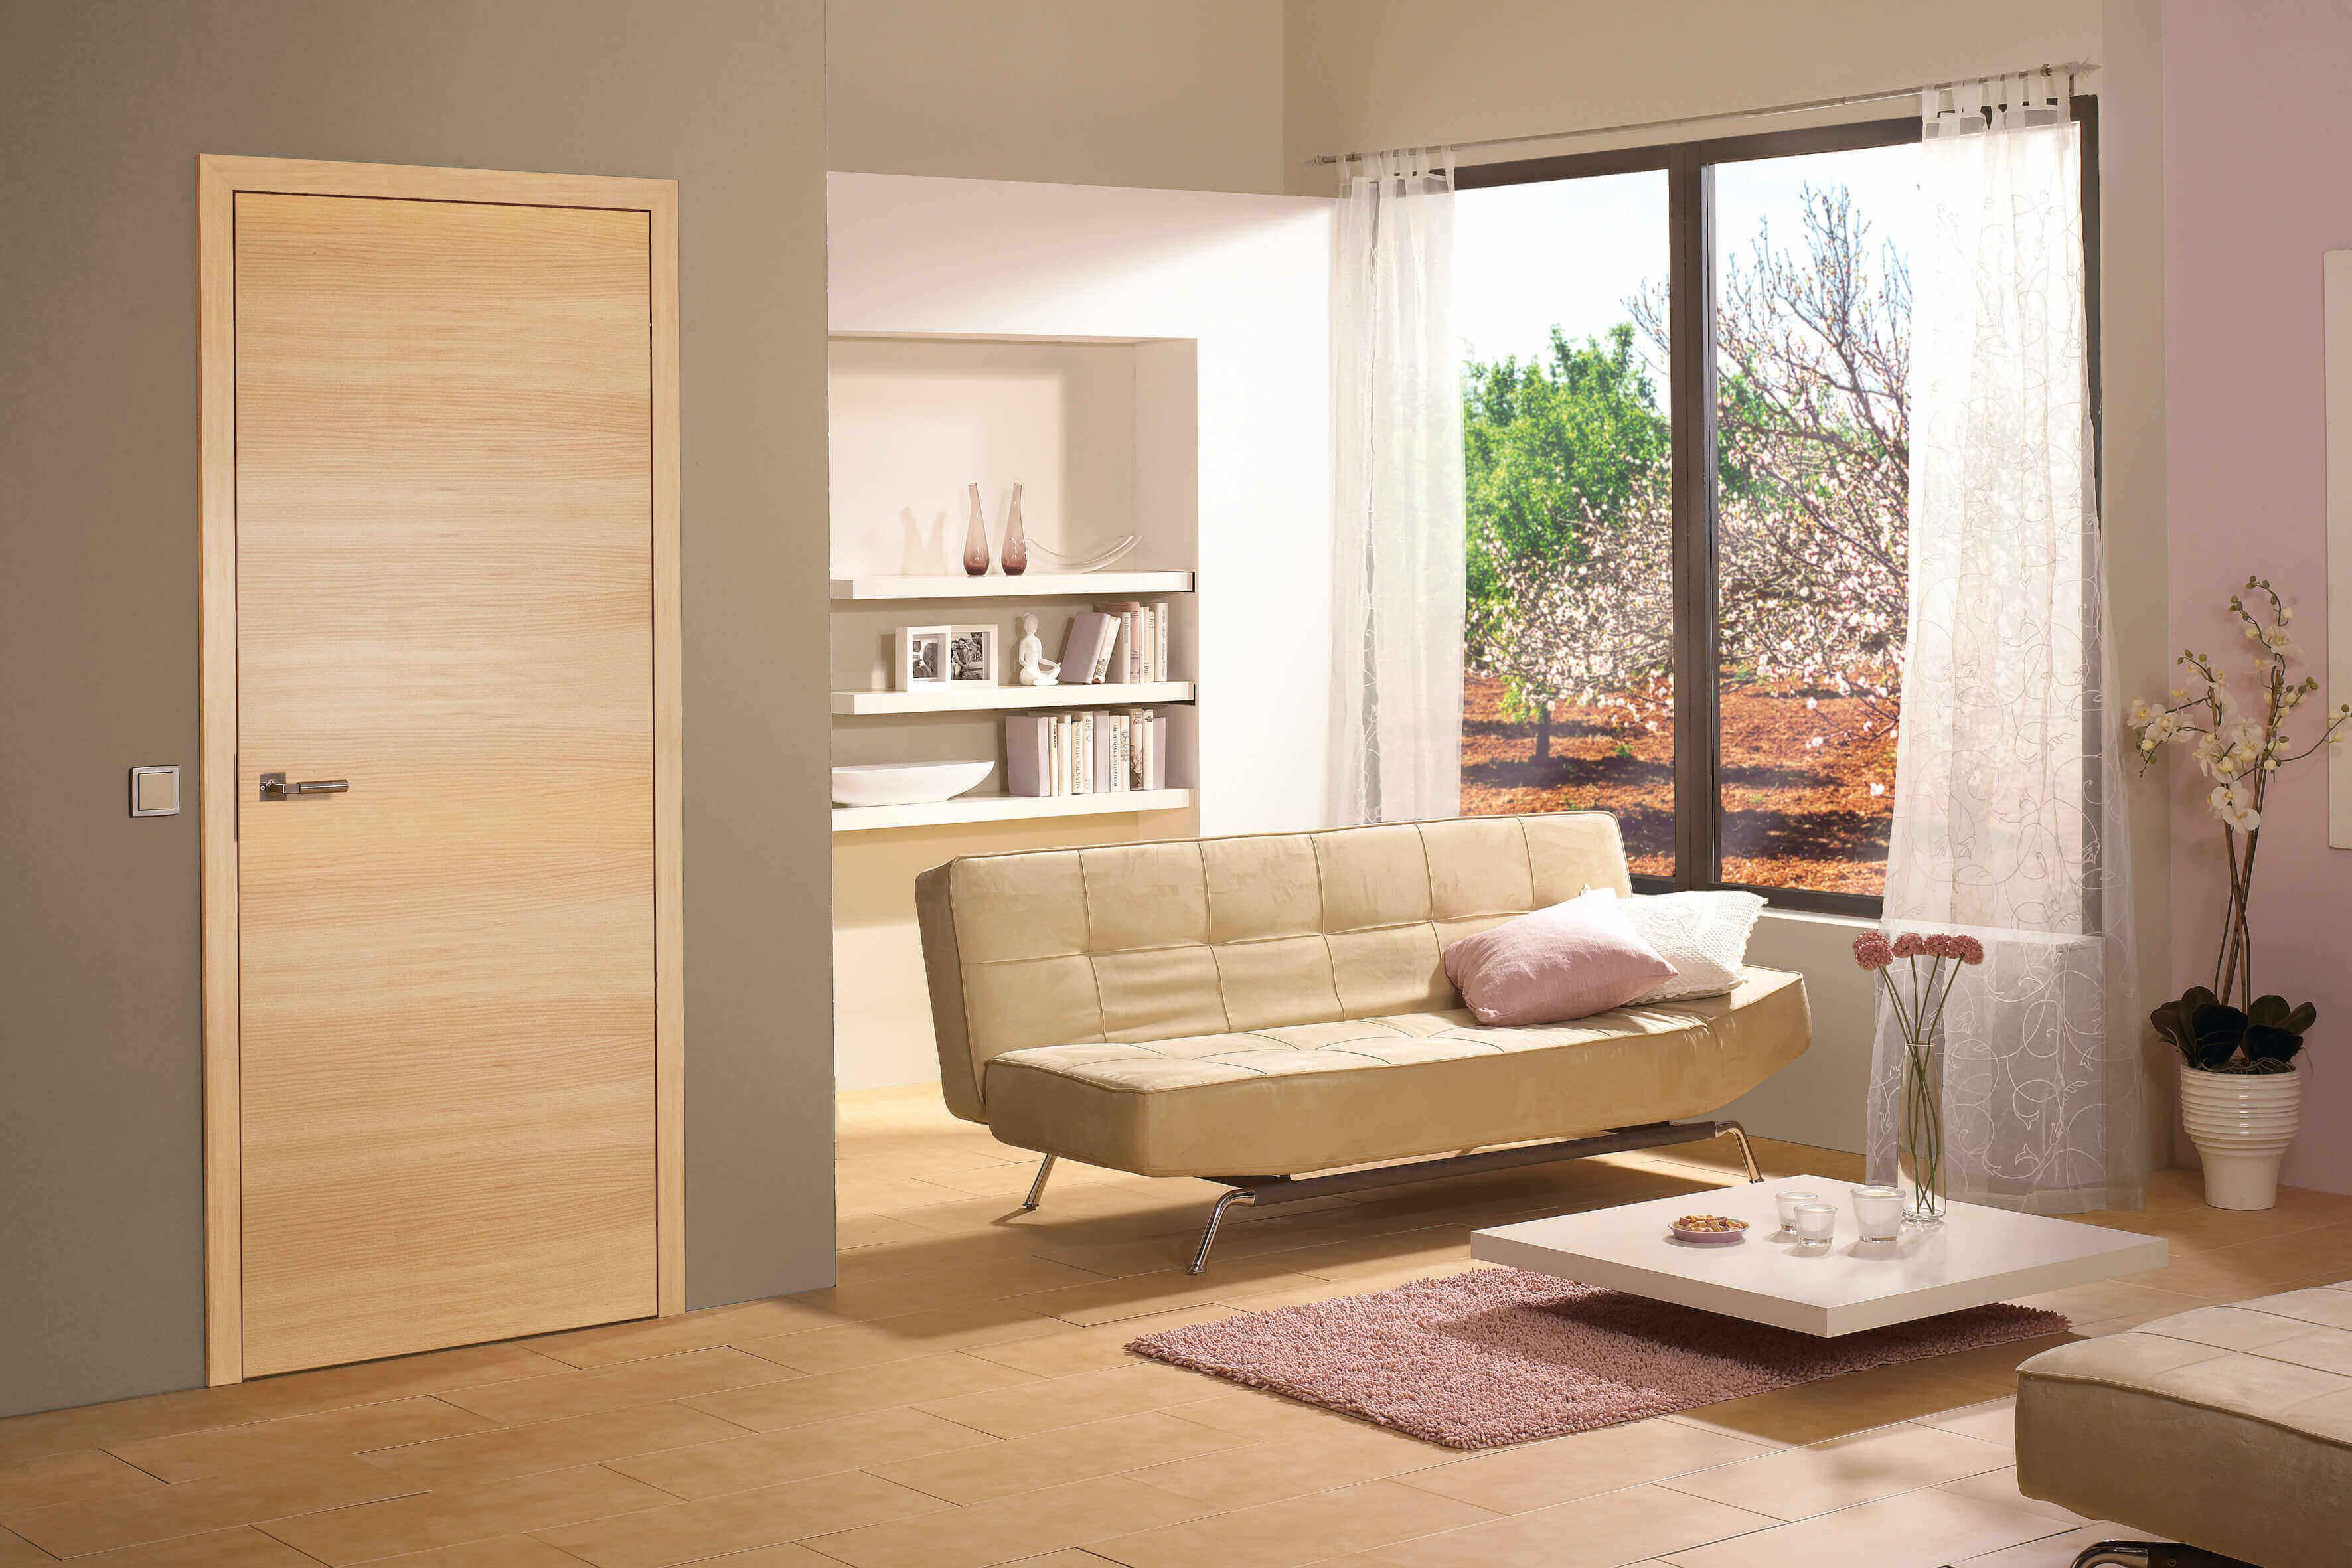 doors b ceiling internal product from en floor hardware raumplus bartels interior tall closet specialty to wood